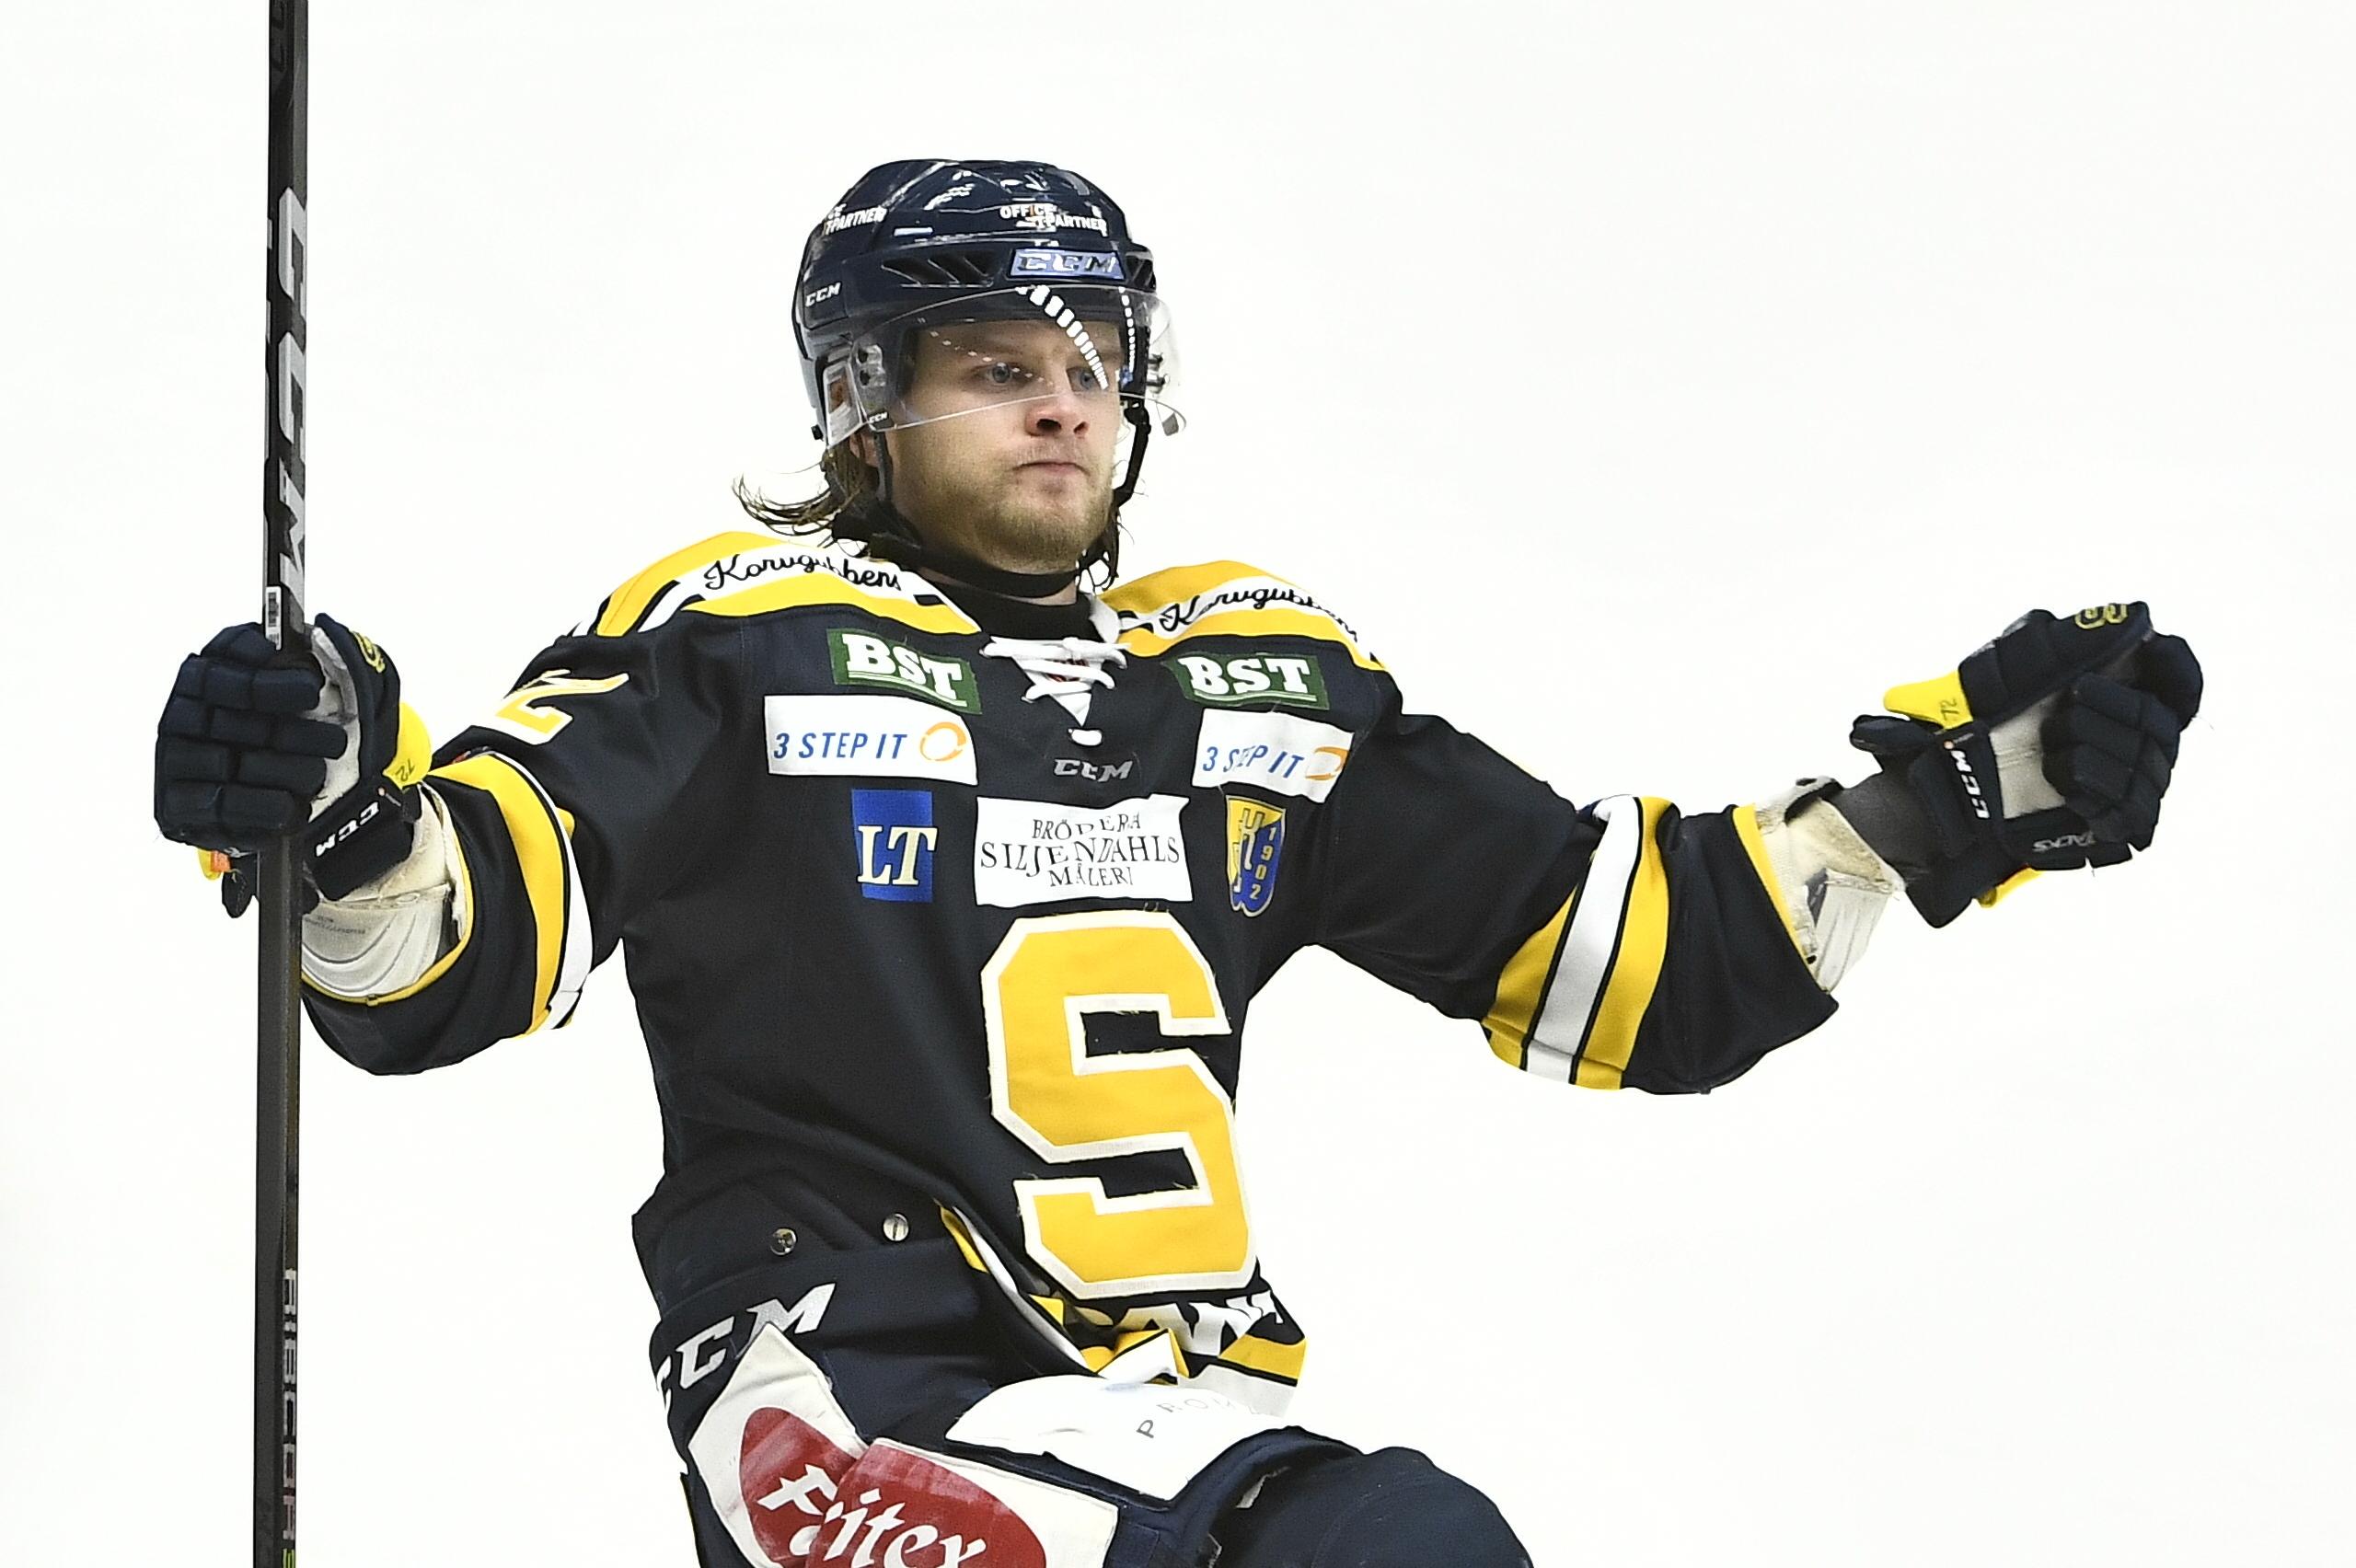 Brandvarm Meyer smelter de svenske hockeyhjerter